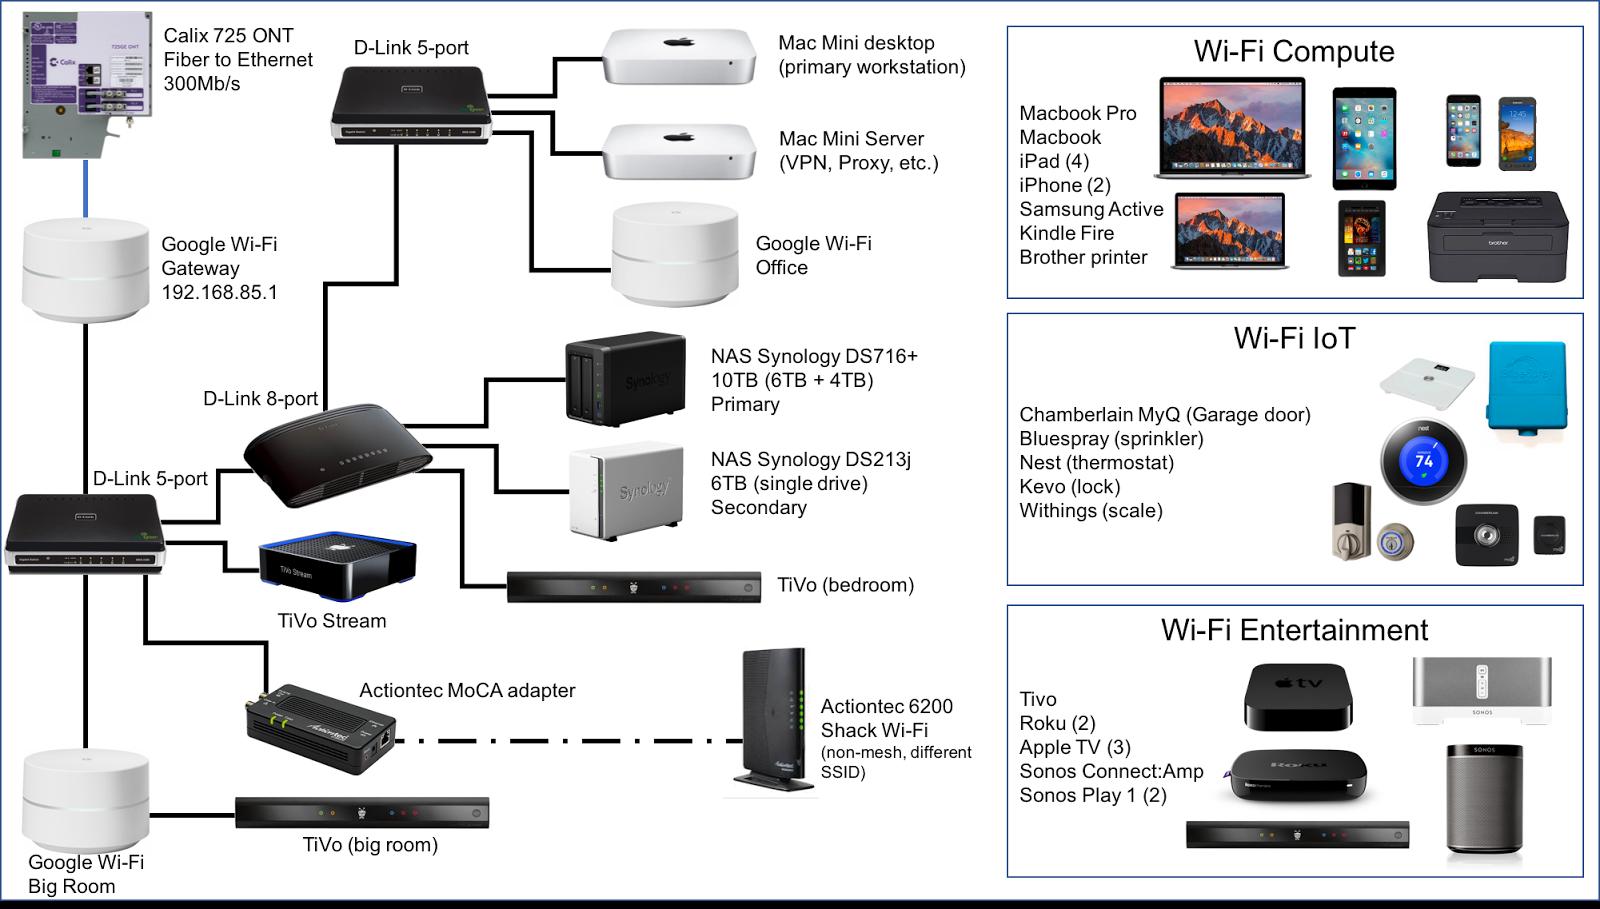 Google Wifi with FIOS, TiVo and MoCA - Google Wifi Help